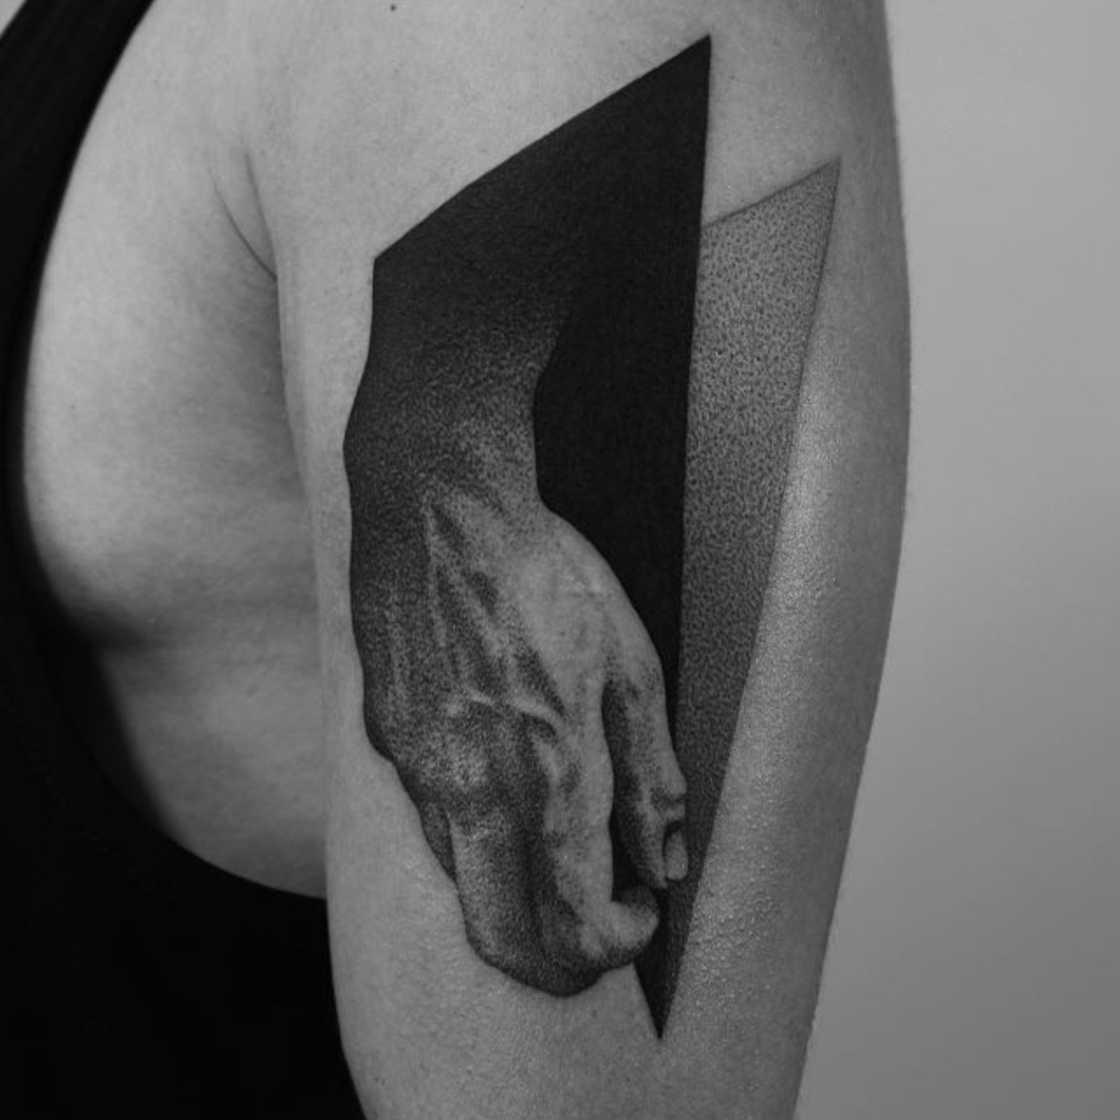 dotyk-dotwork-tattoo-11